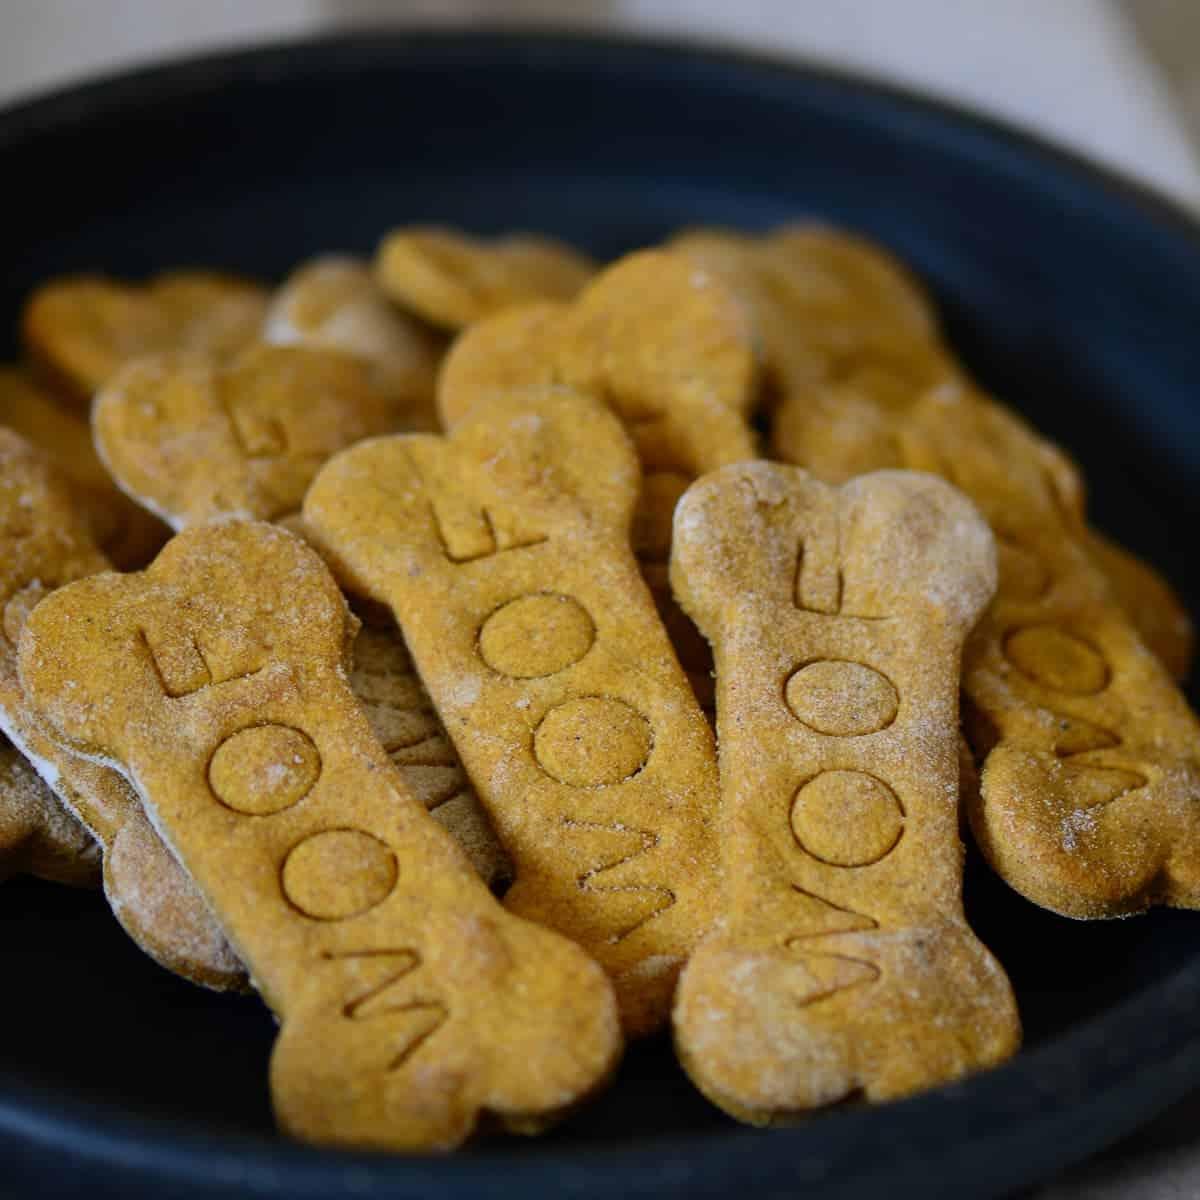 homemade peanut butter dog treats shaped like bones on a black plate | foodology geek